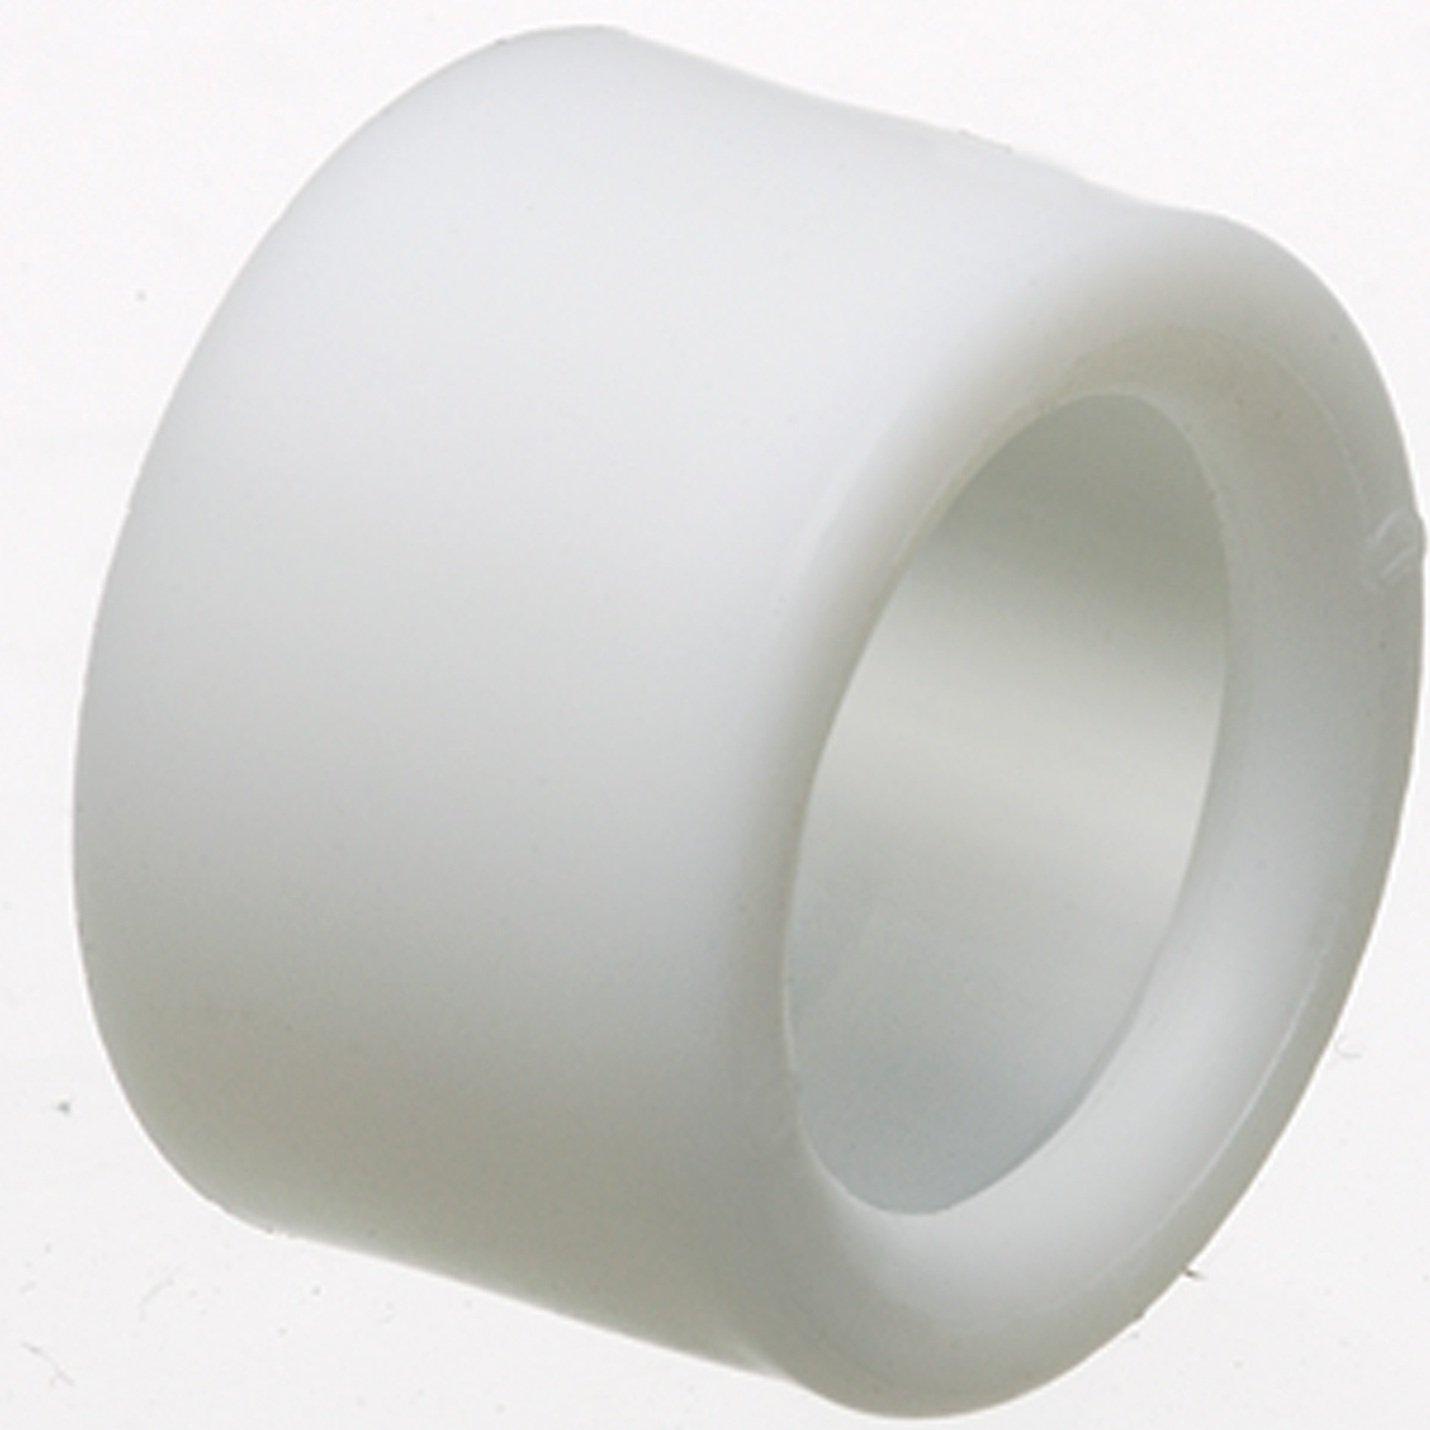 Arlington EMT300-25 EMT Insulating Conduit Bushing for Electrical Metal Tubing, White, 3-Inch, 25-Pack